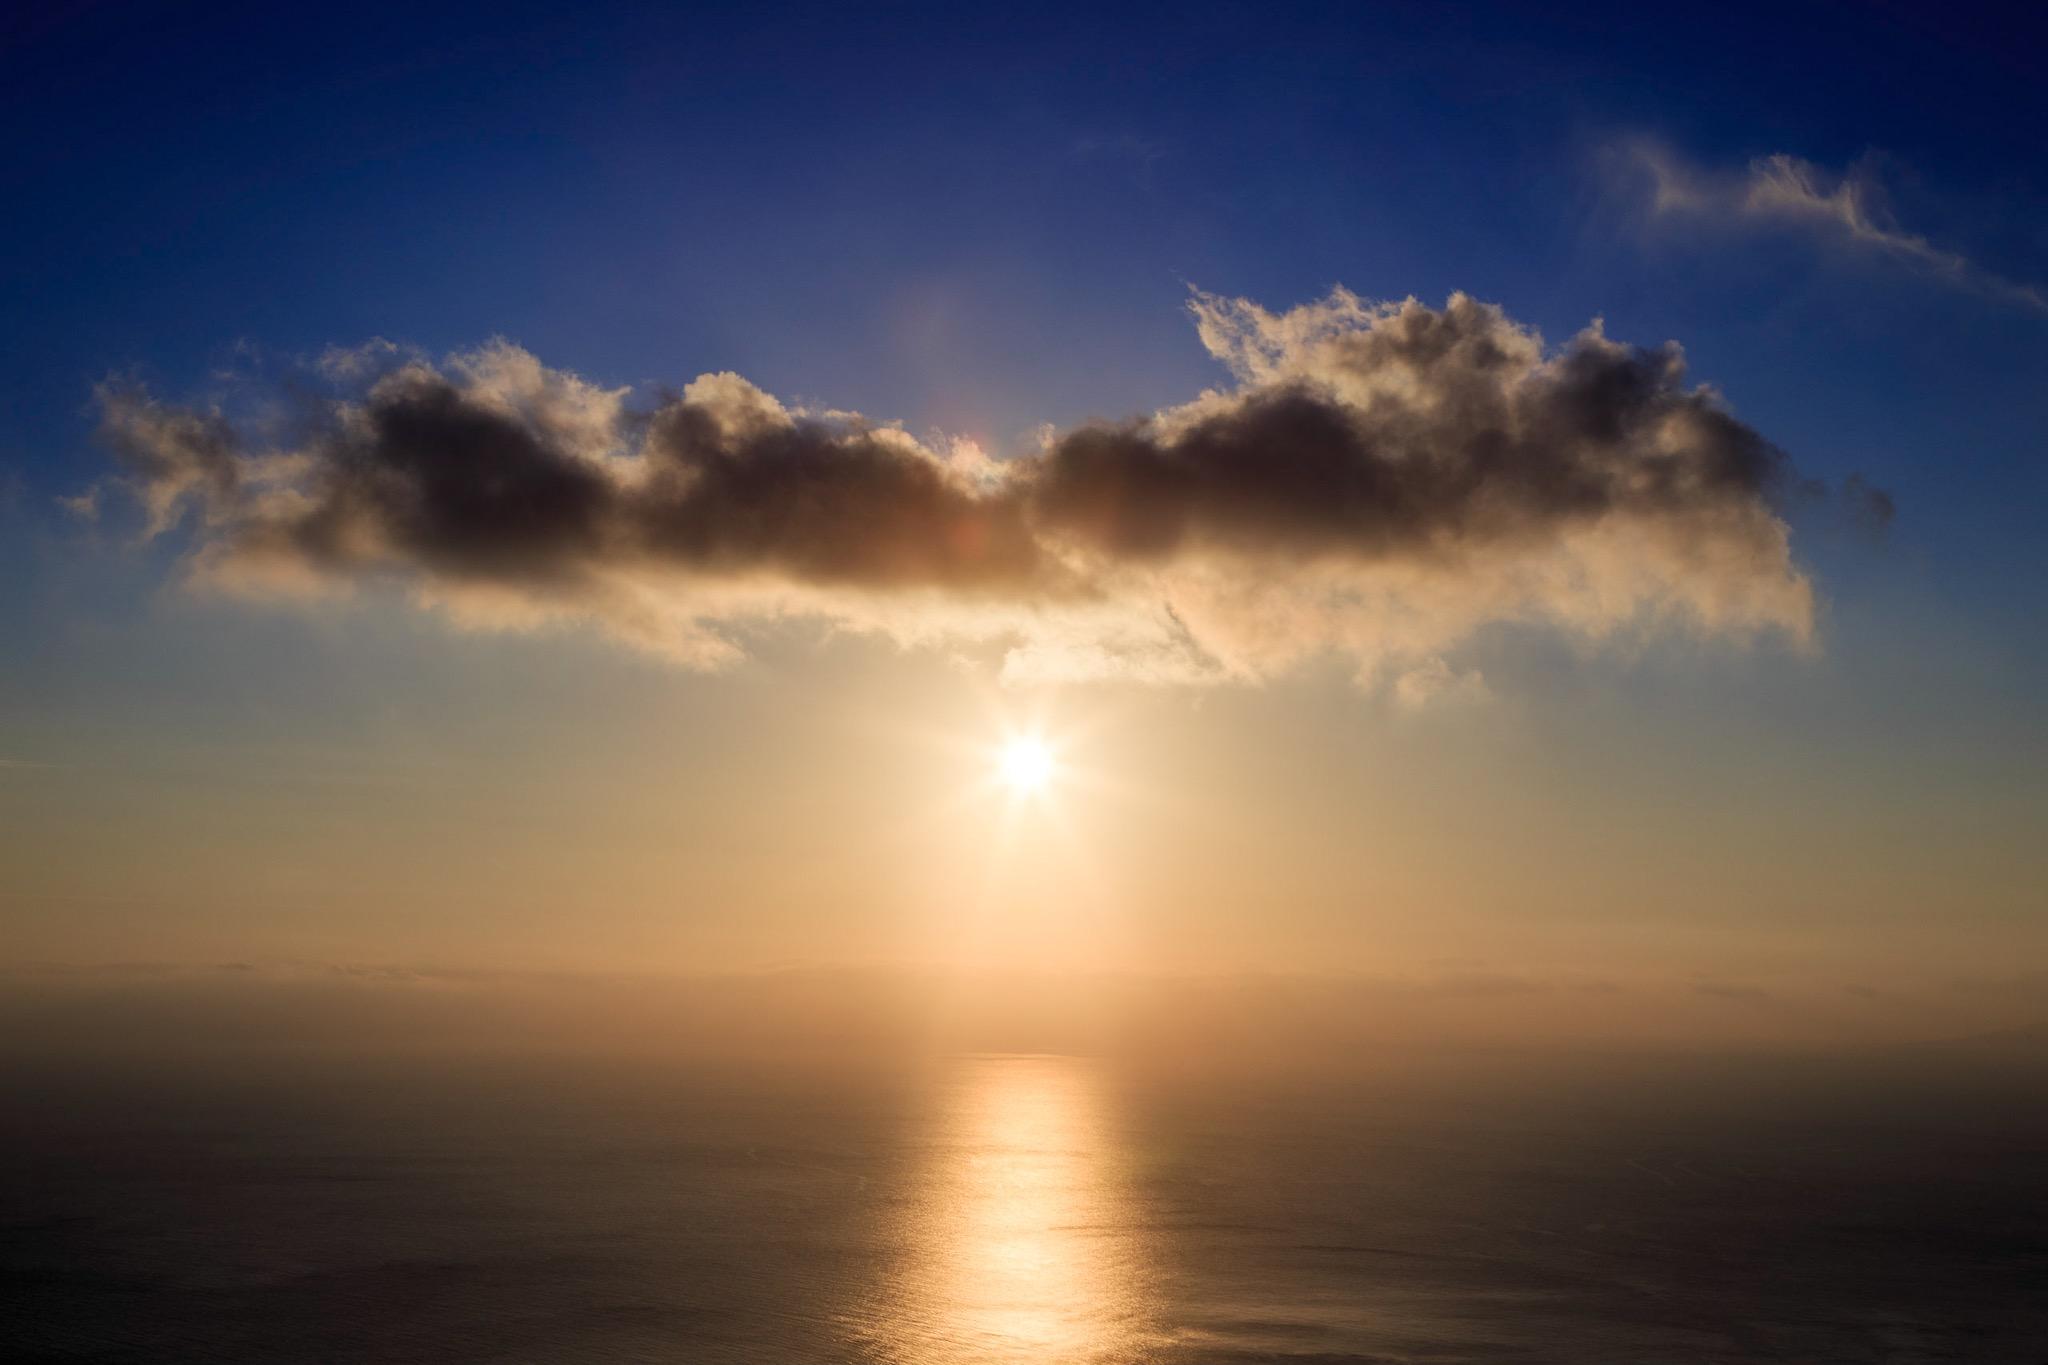 Sunrise in Santorini by Travel Photographer Rick McEvoy